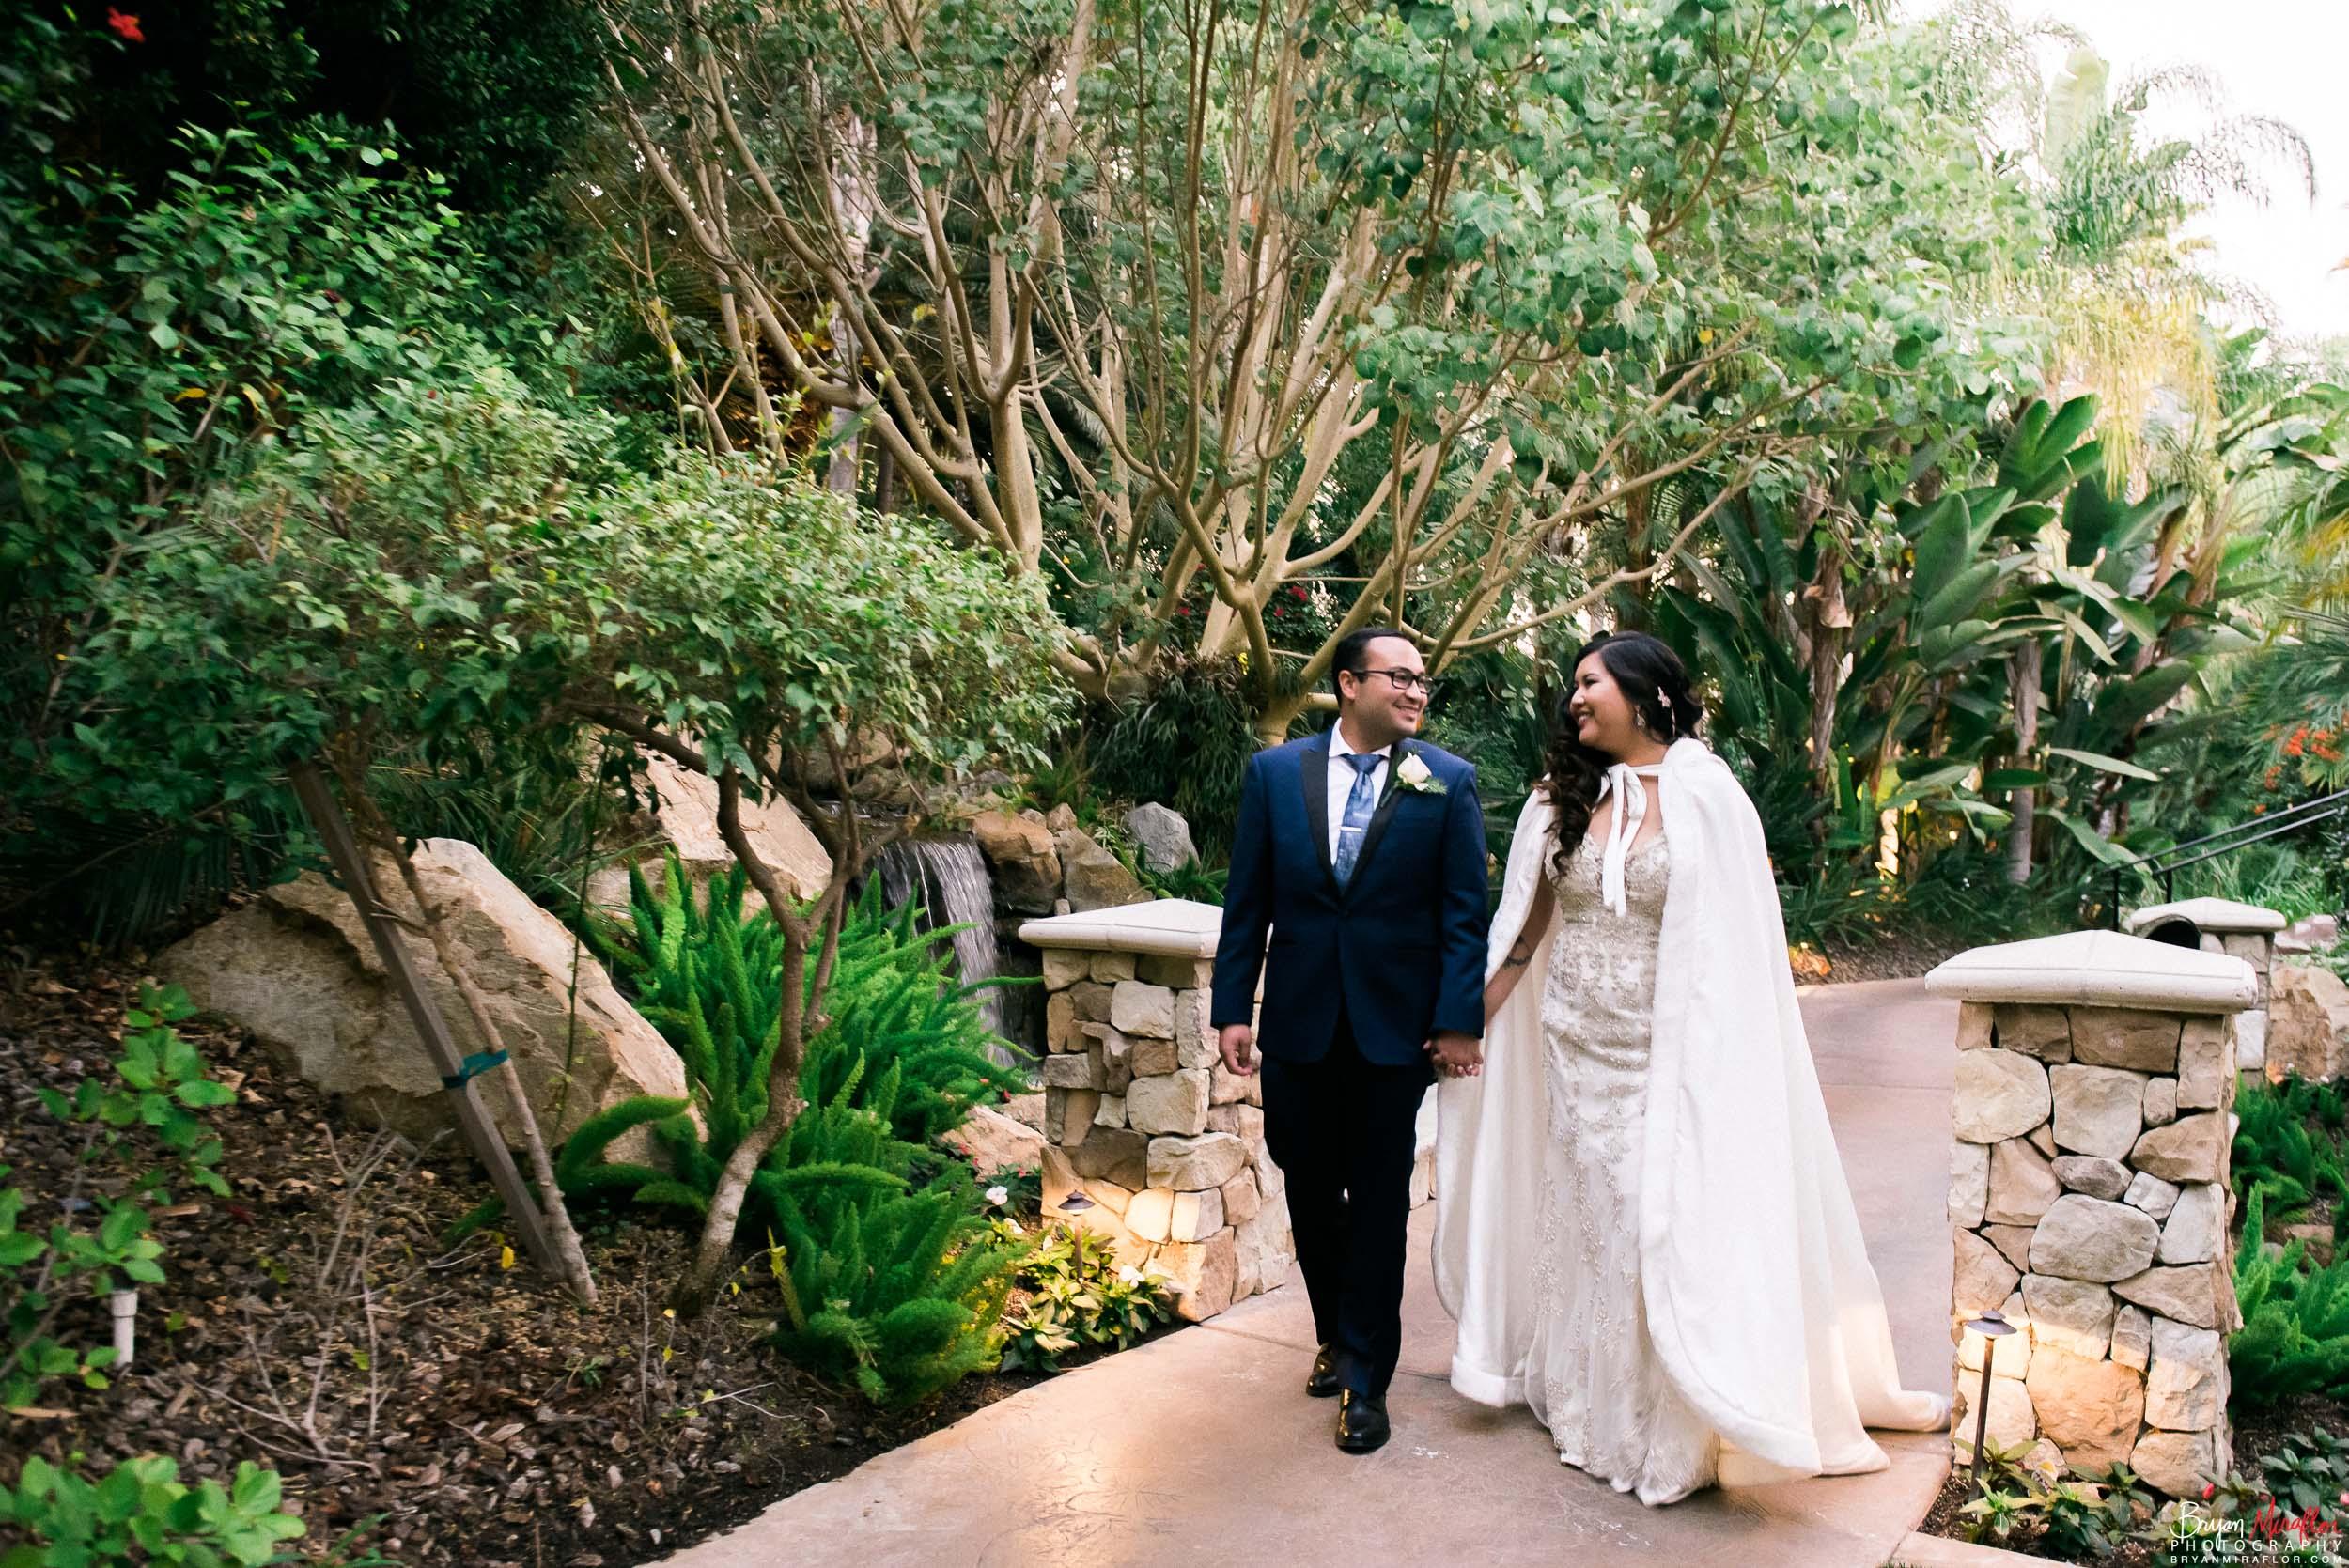 Bryan-Miraflor-Photography-Hannah-Jonathan-Married-Grand-Traditions-Estate-Gardens-Fallbrook-20171222-009.jpg